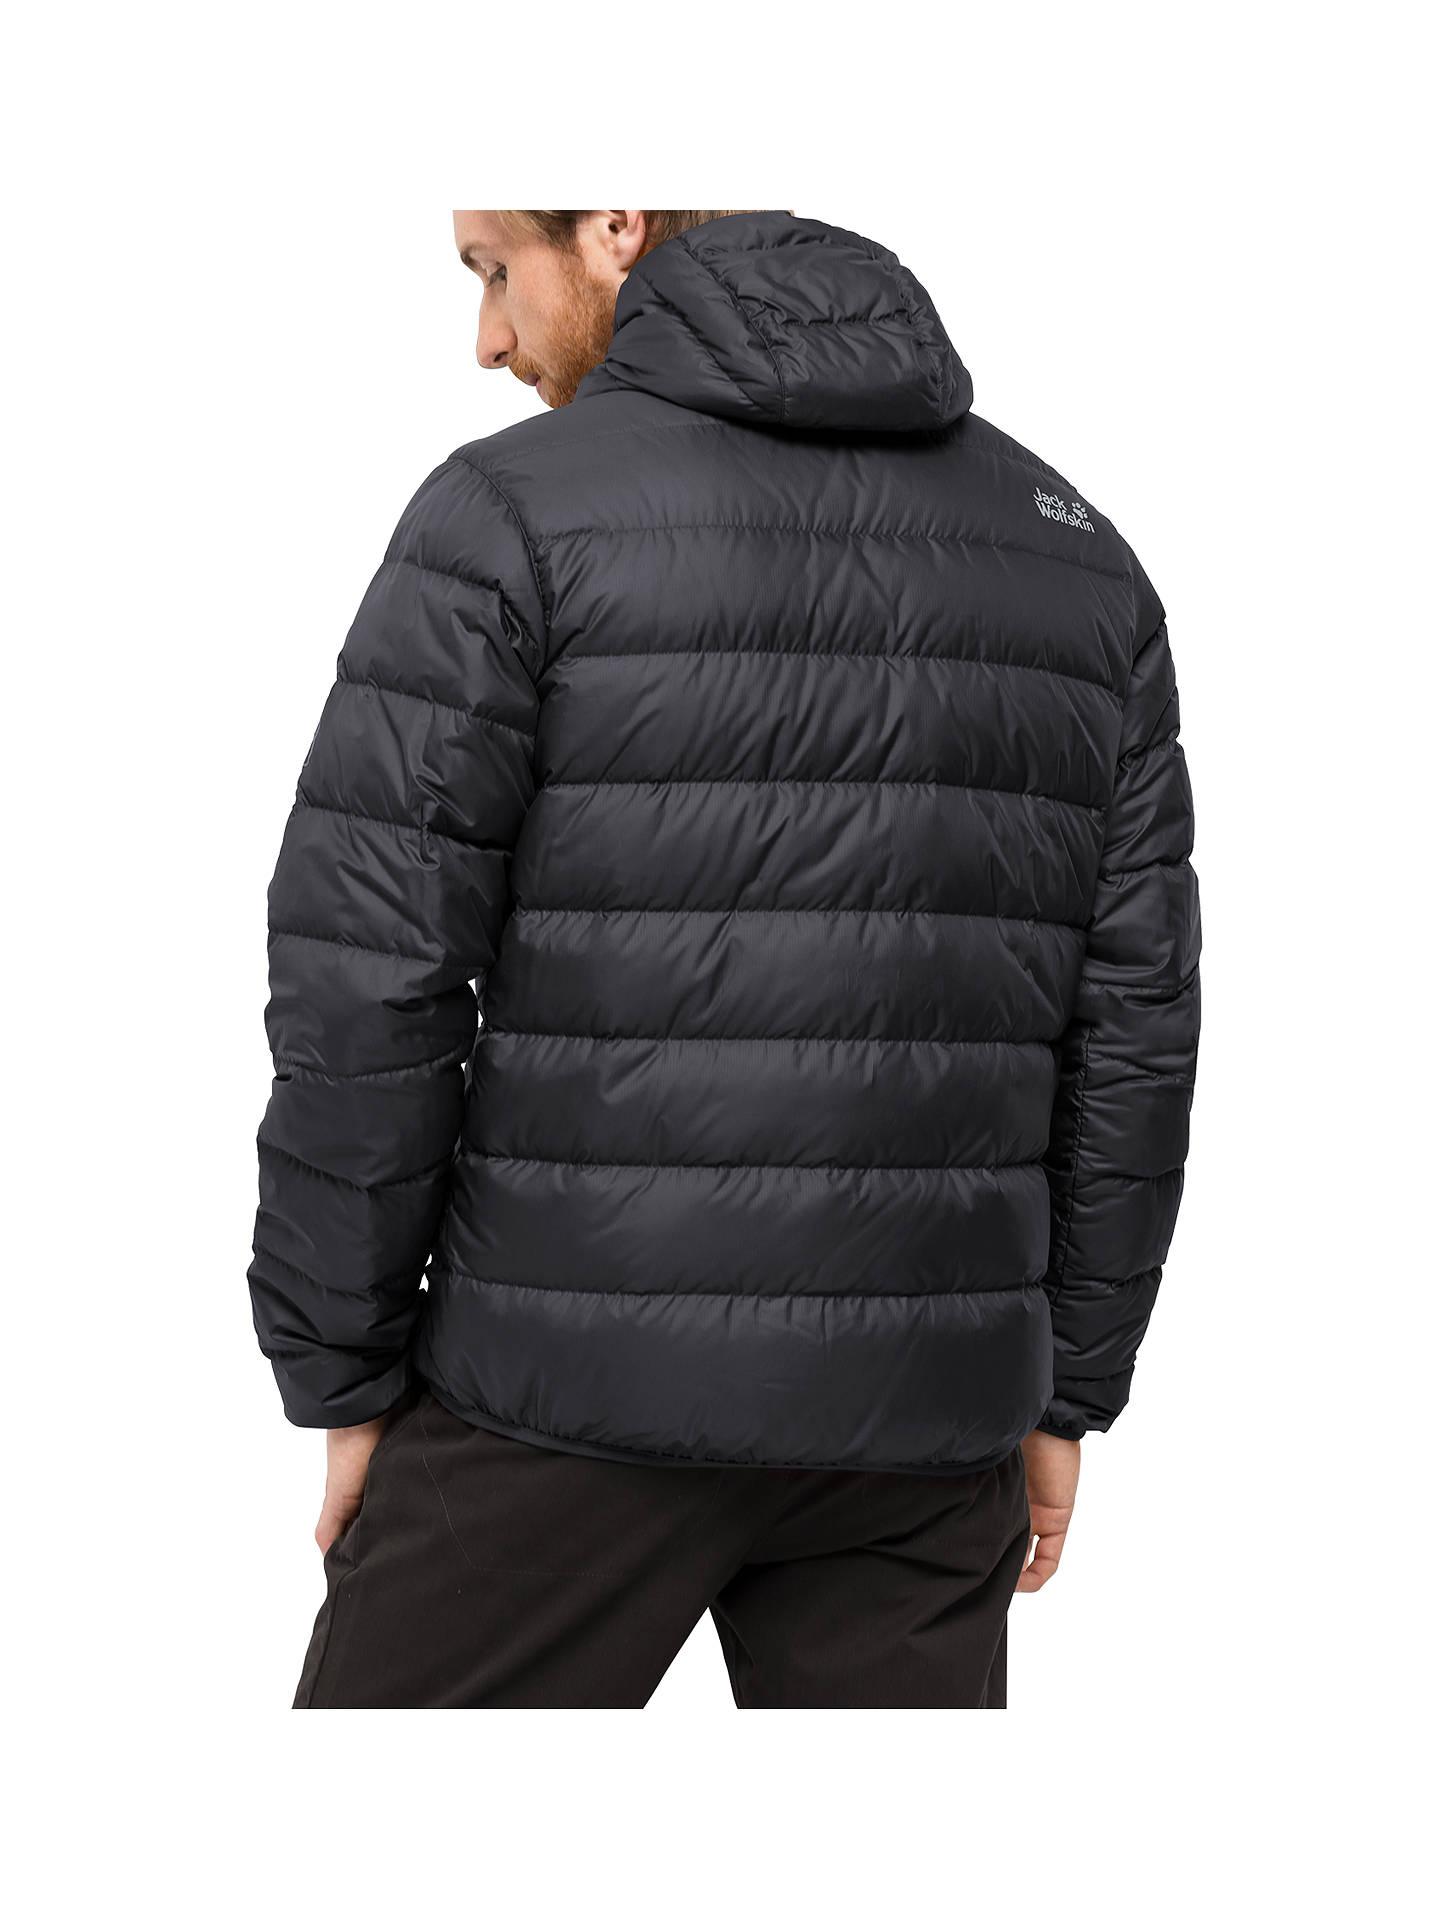 731d43ecee7 ... Buy Jack Wolfskin Helium Men's Jacket, Ebony, XL Online at johnlewis.  ...